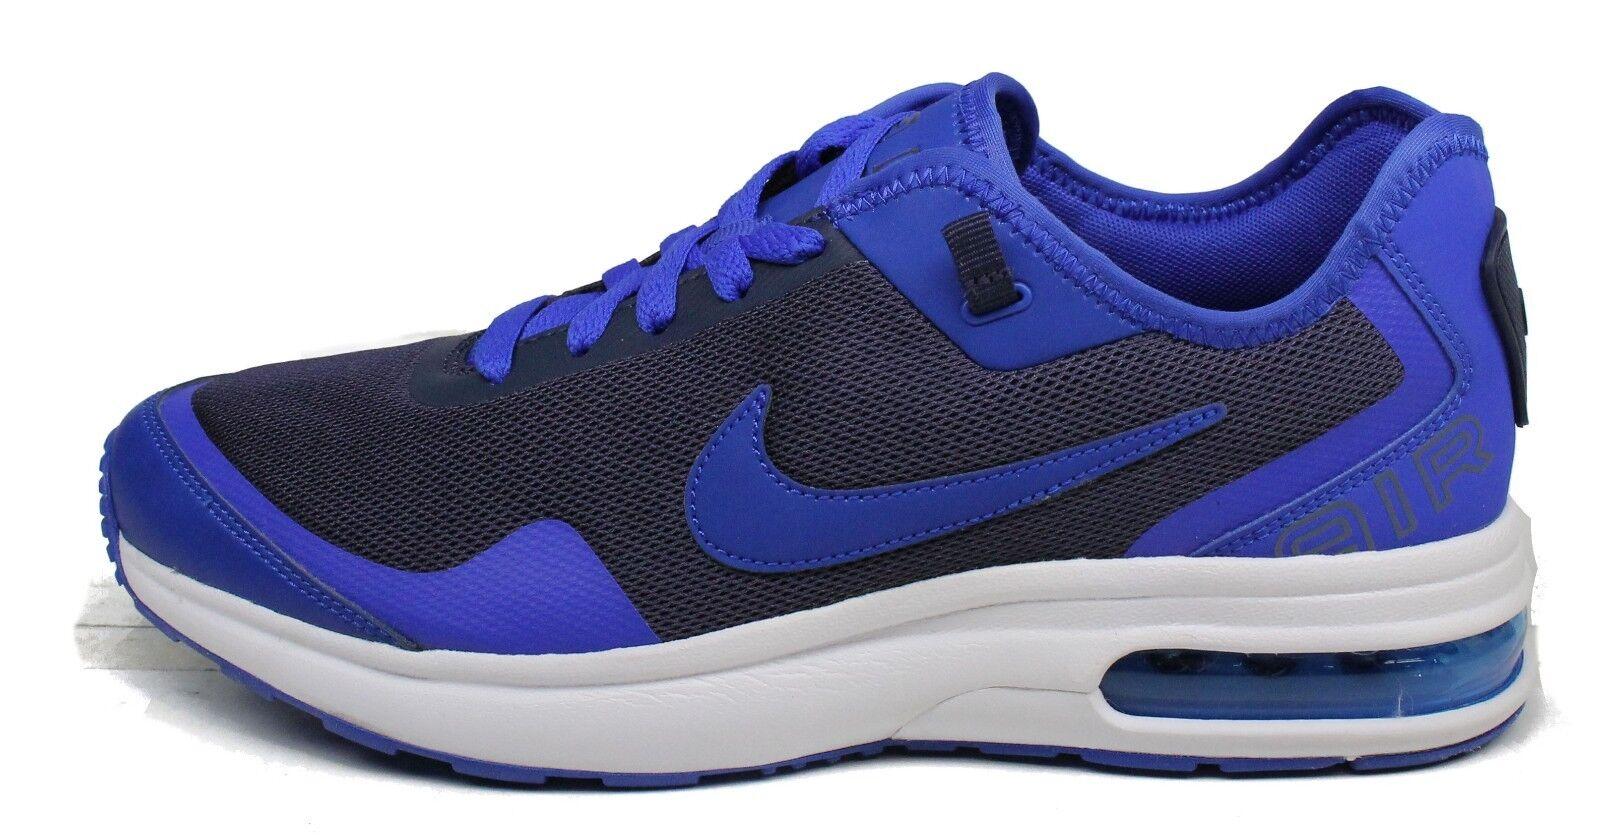 männer - nike ® größe sume59 nwob blaue sportschuhe größe ® 9. 790f7b